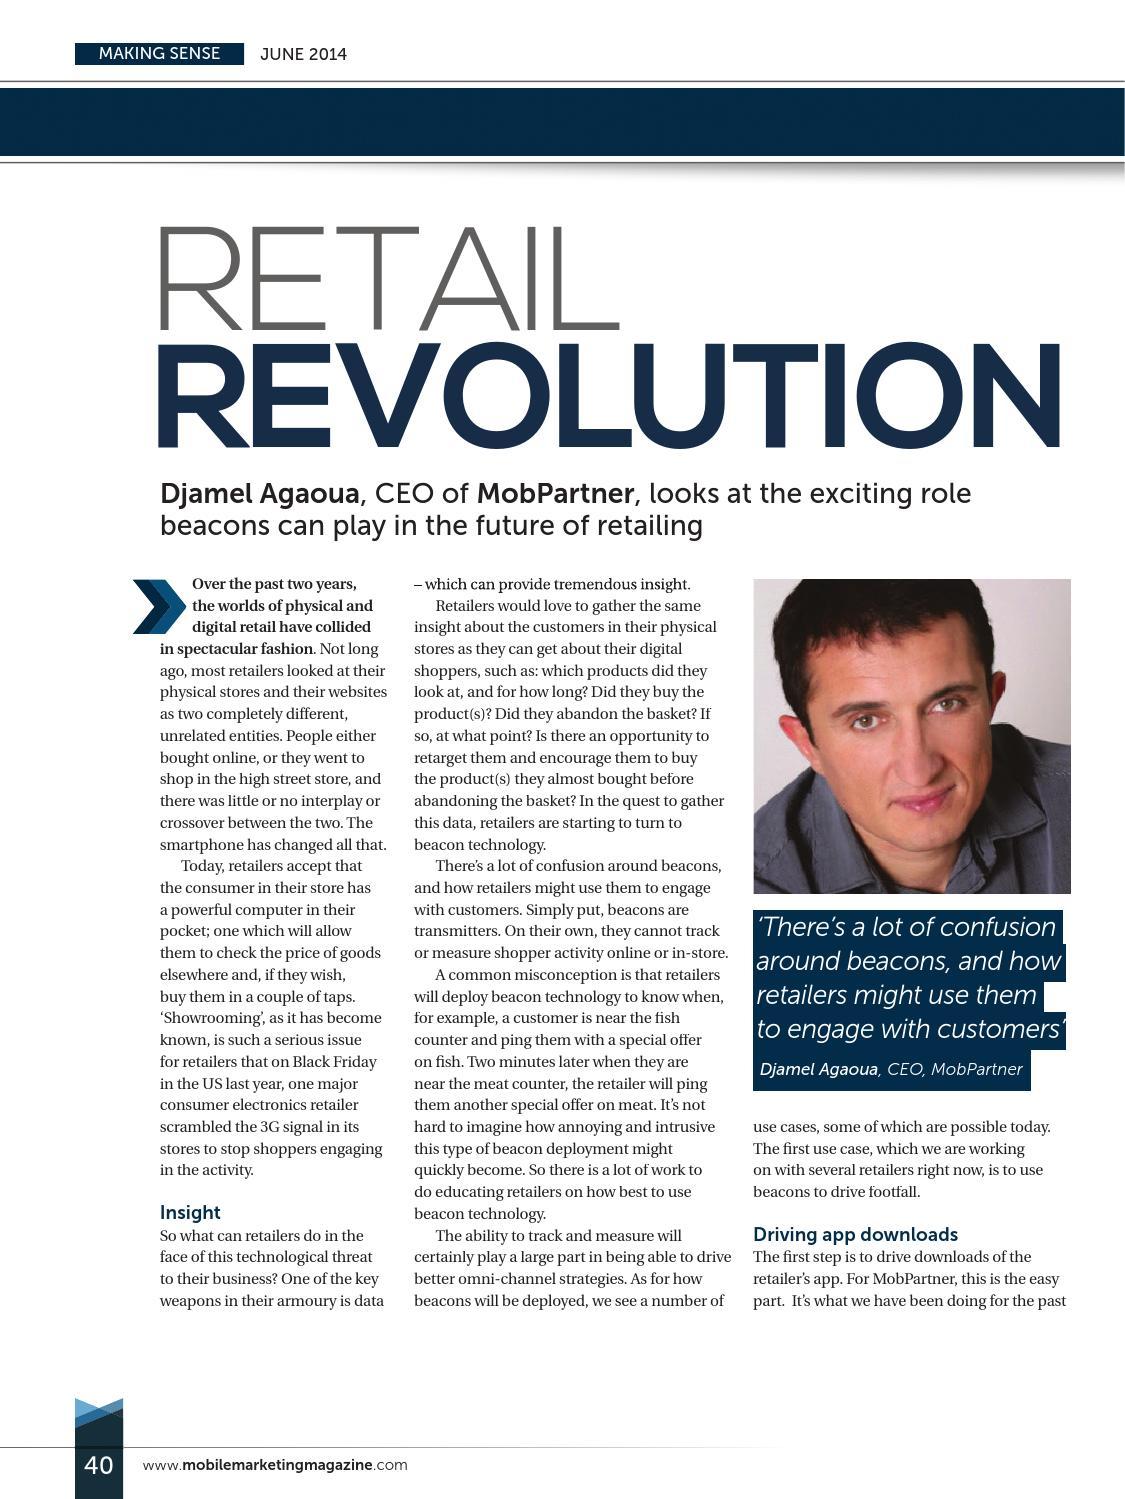 Mobile Marketing Issue 17 - June 2014 by Mobile Marketing Magazine - issuu